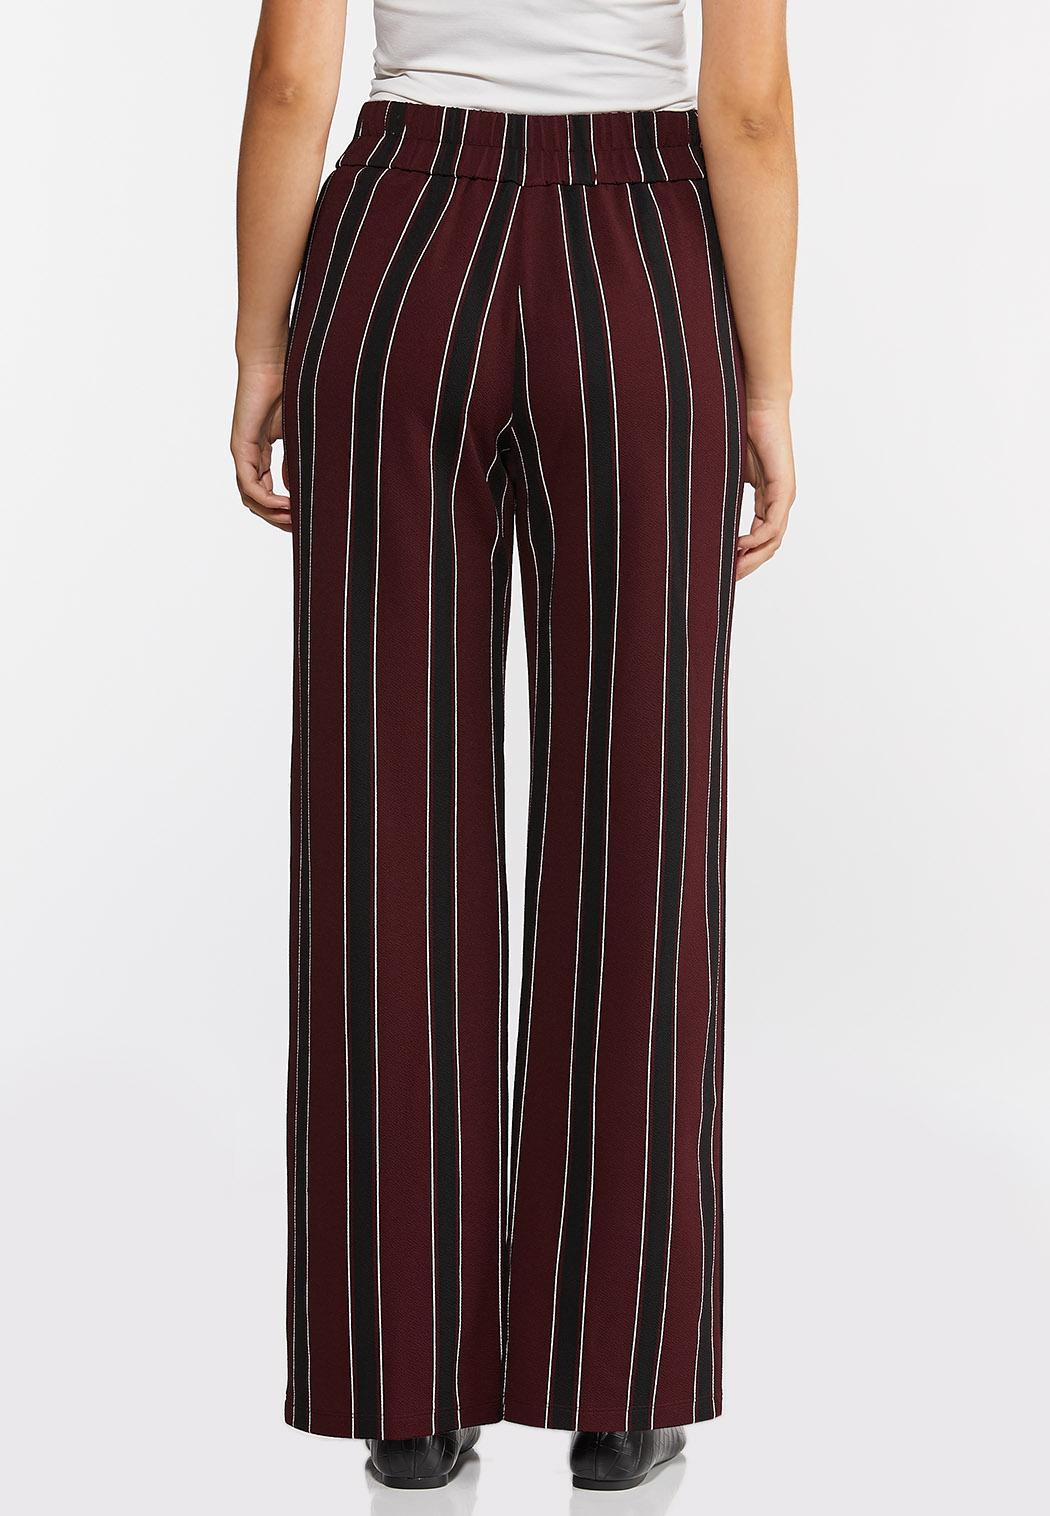 Petite Striped Wide Leg Pants (Item #44314379)